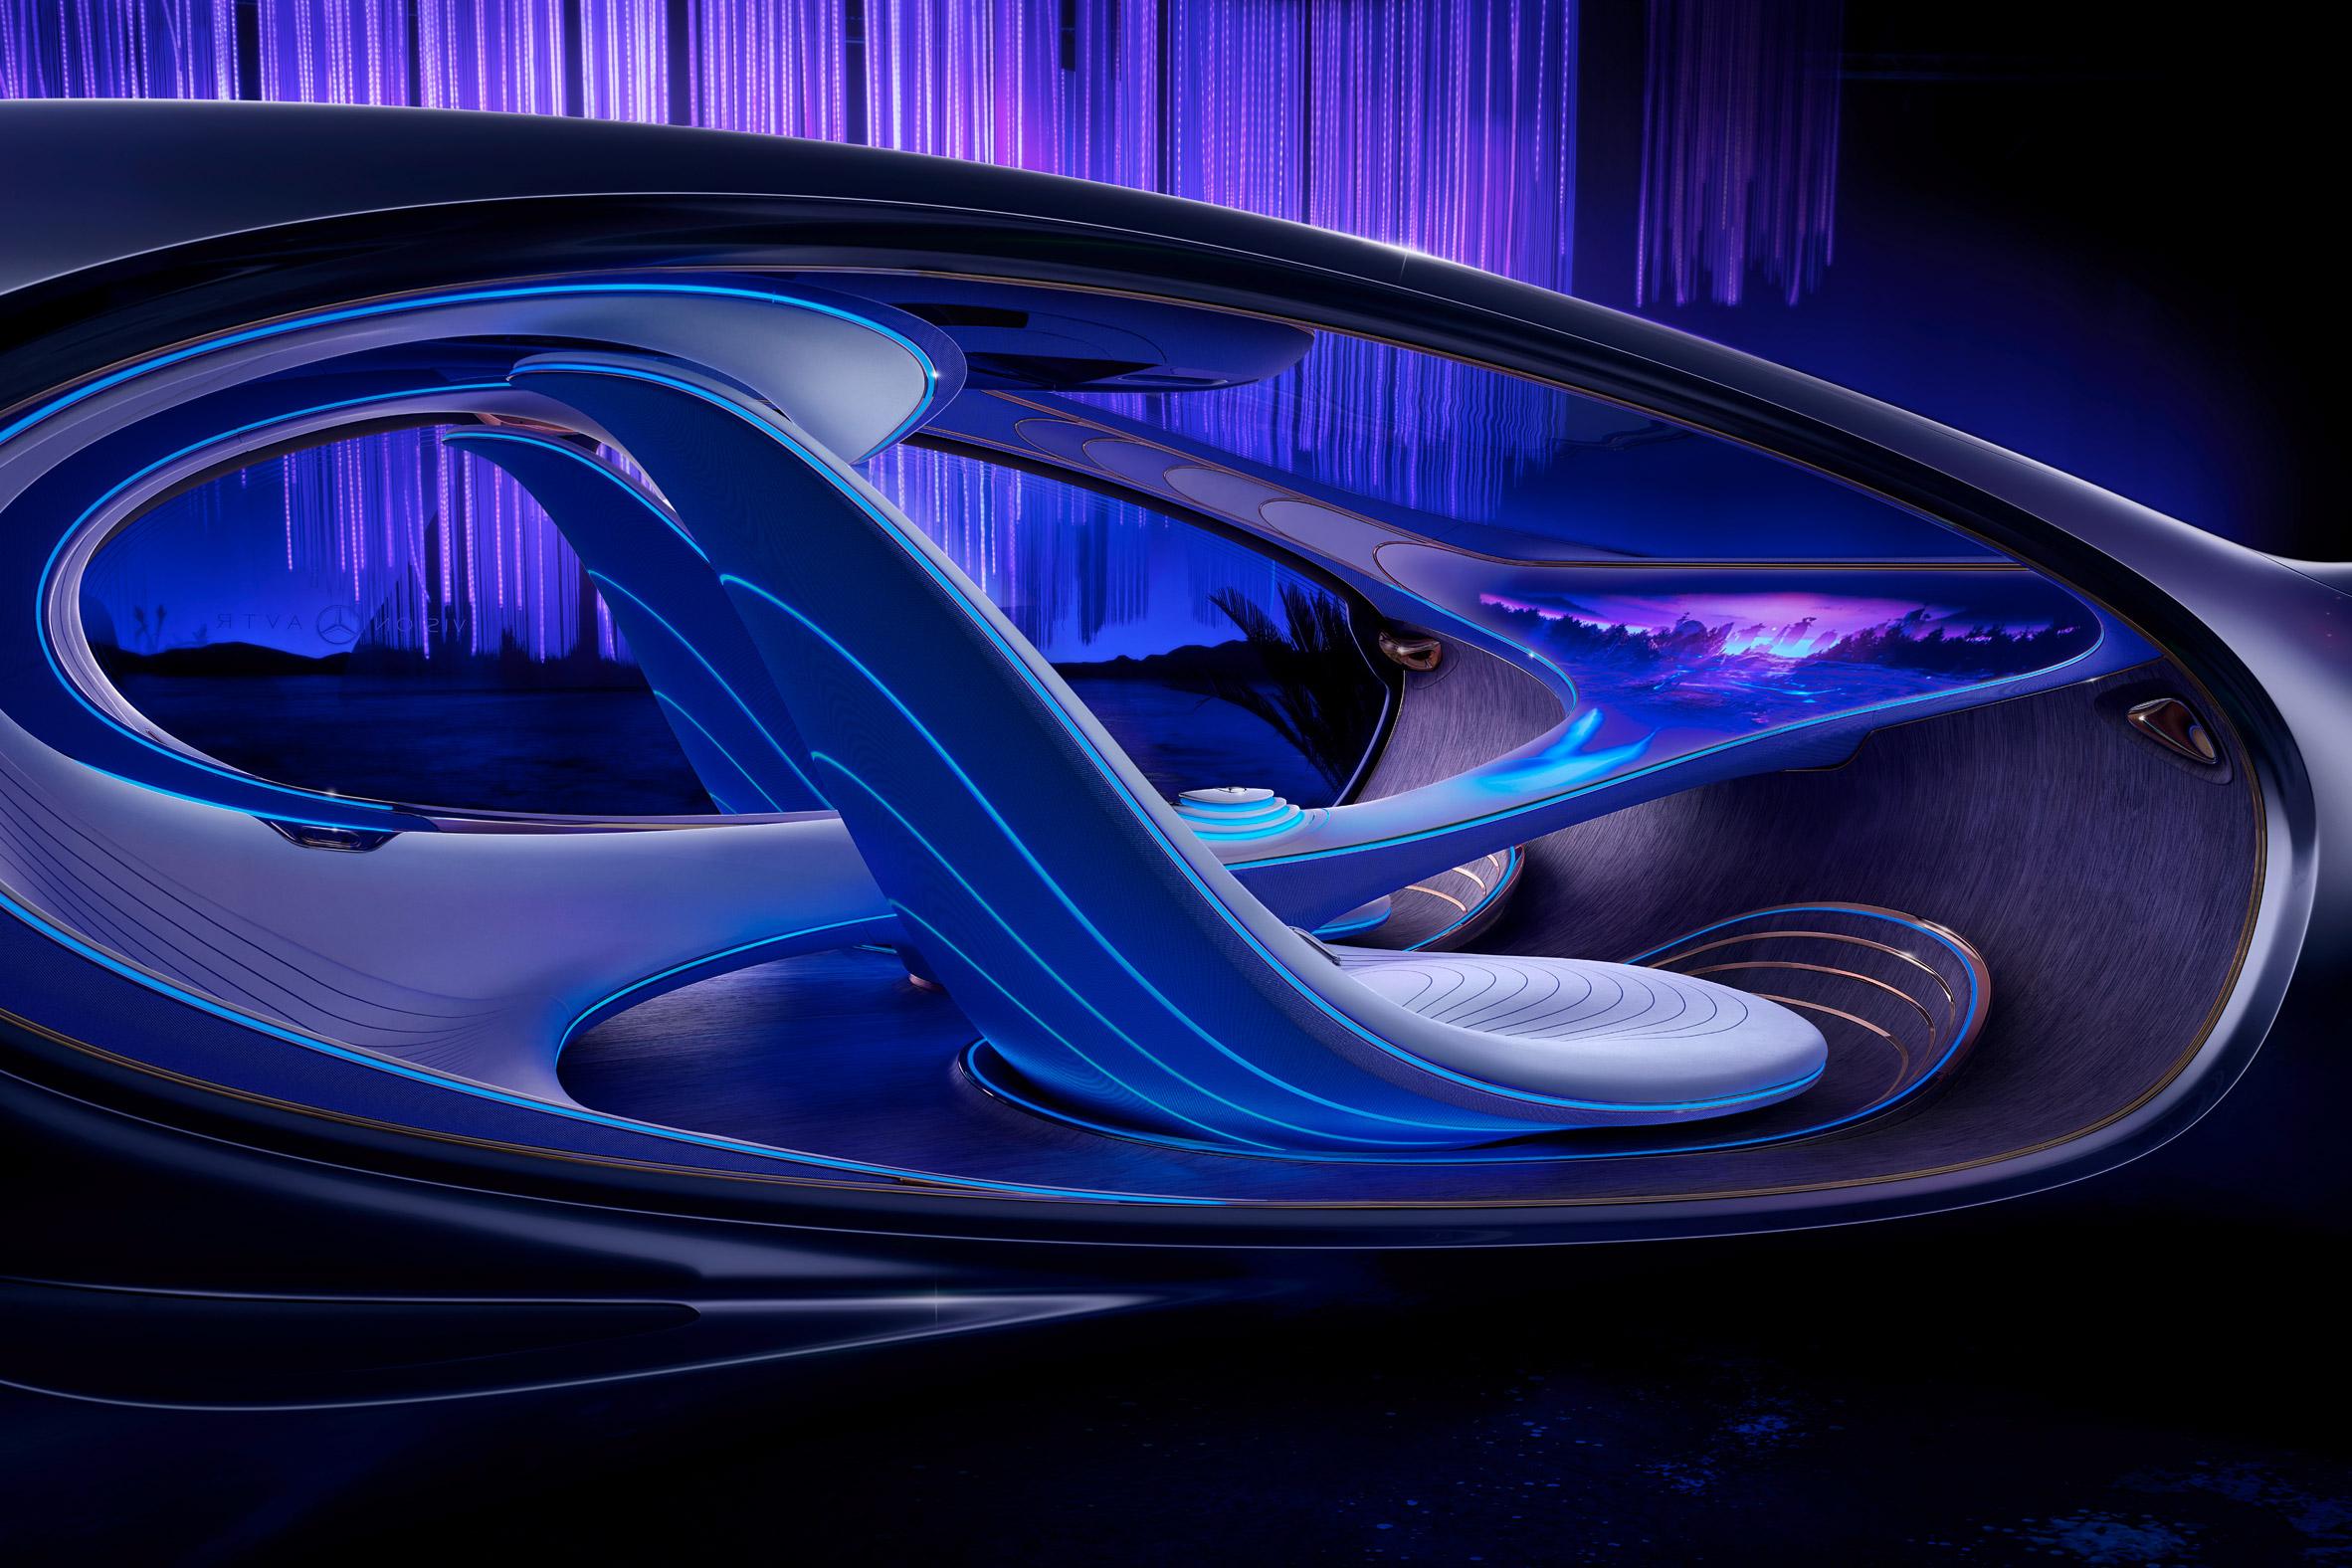 150X150 Avatar mercedes-benz unveils avatar-inspired concept car at ces 2020